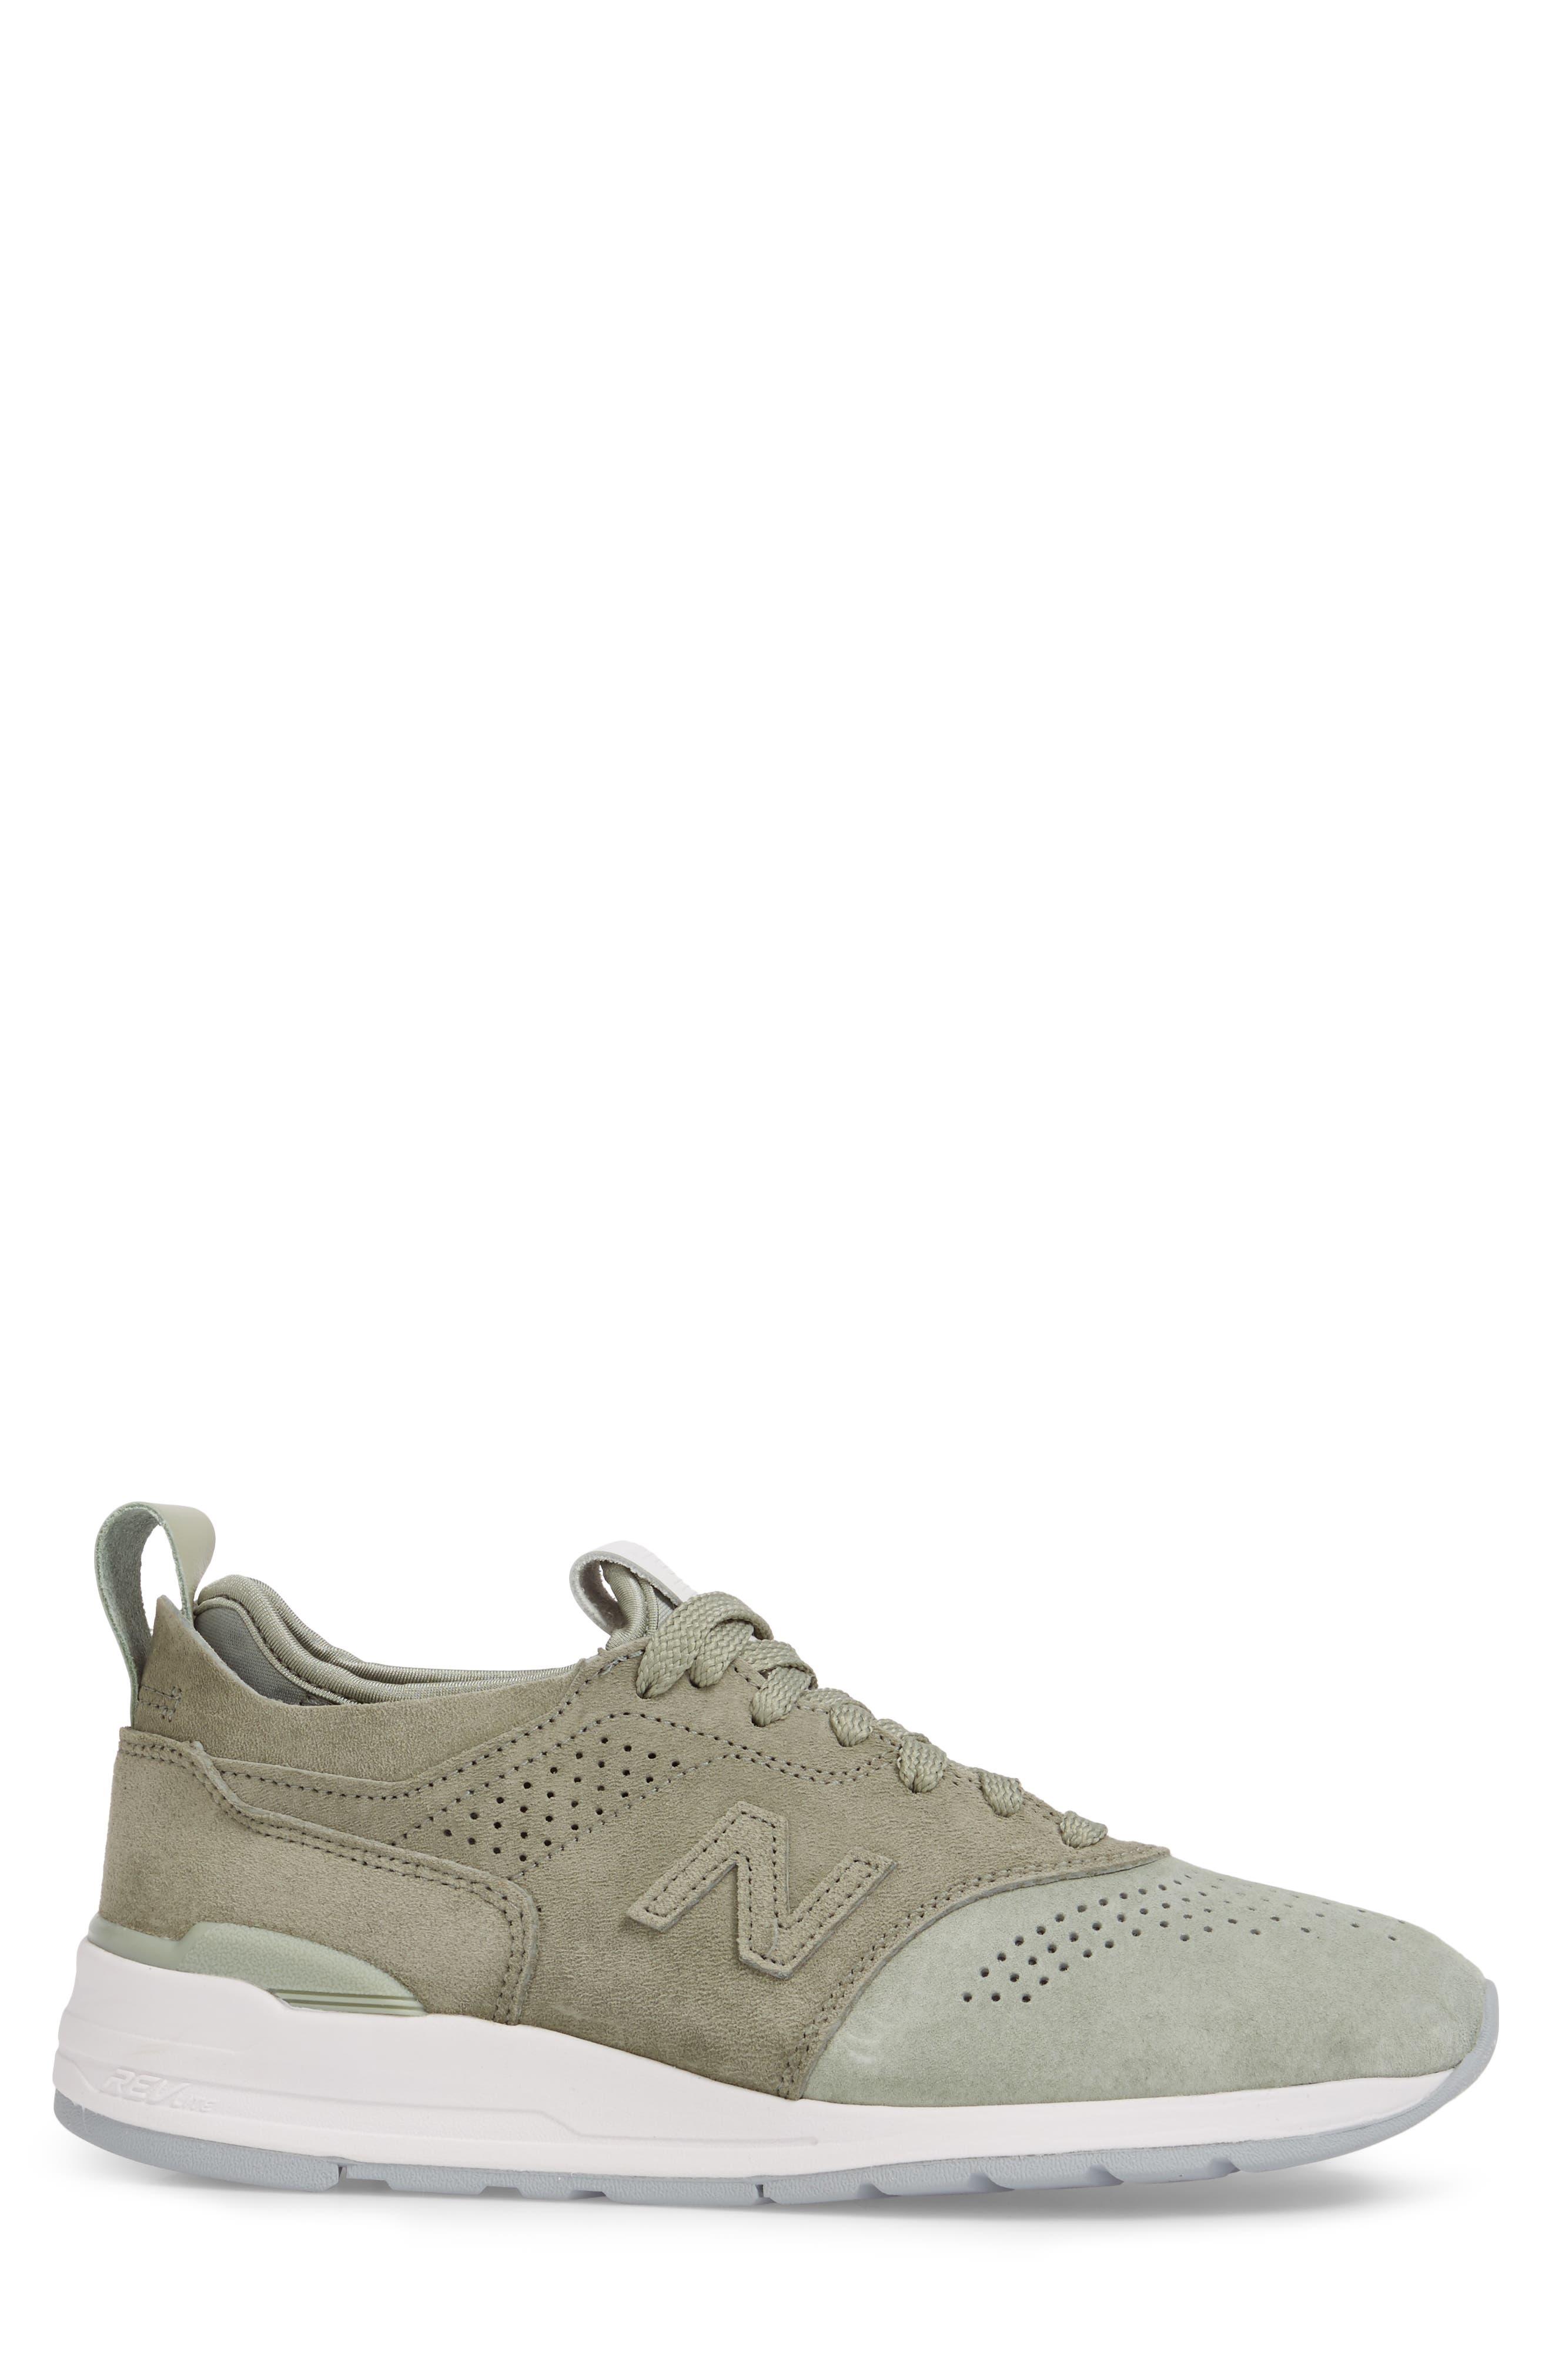 Alternate Image 3  - New Balance 997R Perforated Sneaker (Men)